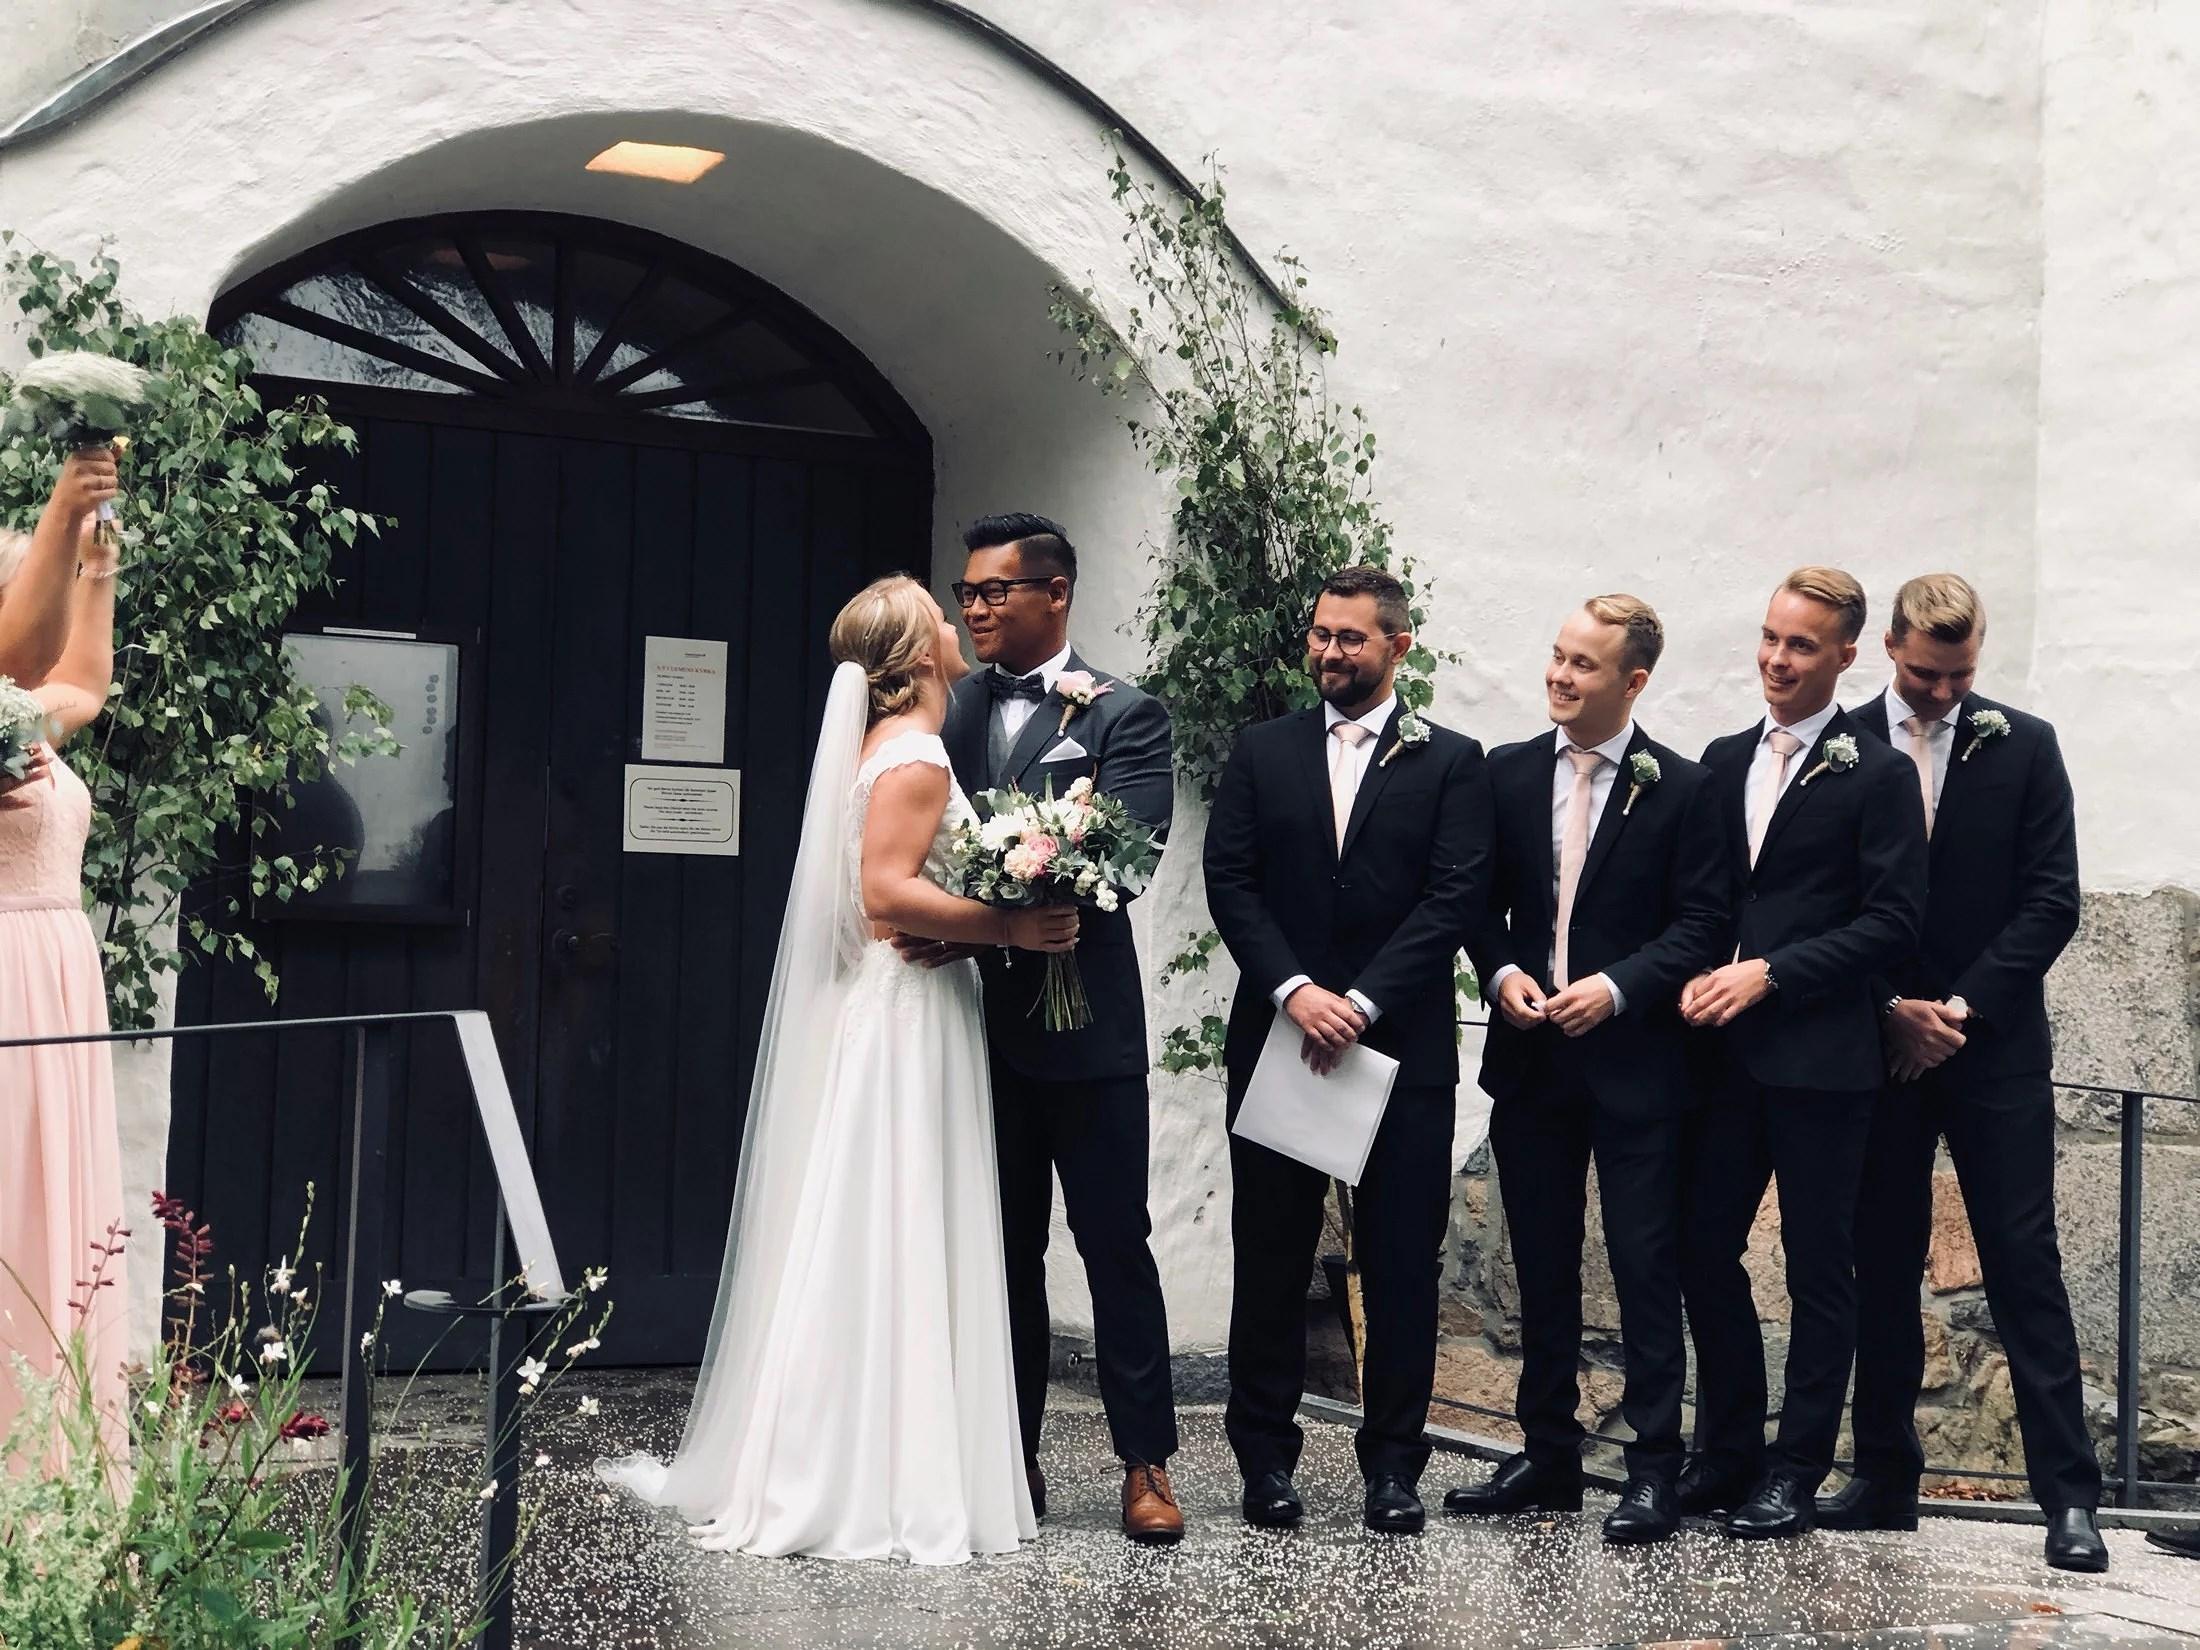 The Wedding 👰🏽⛪️🤵🏾